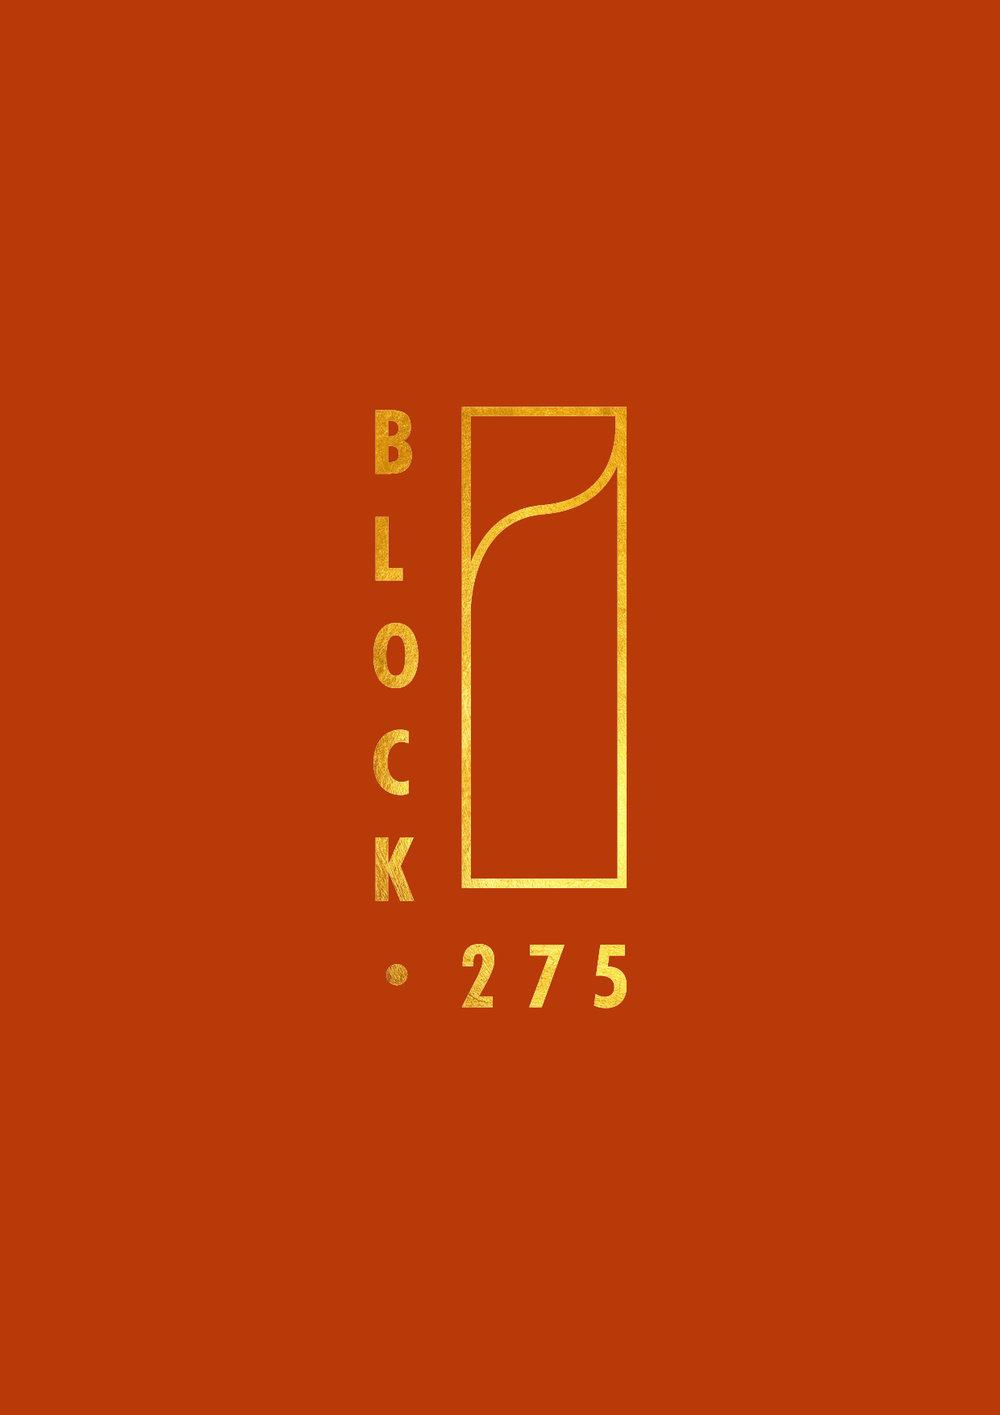 Block 275_Logo Concept 1 - 3.jpg